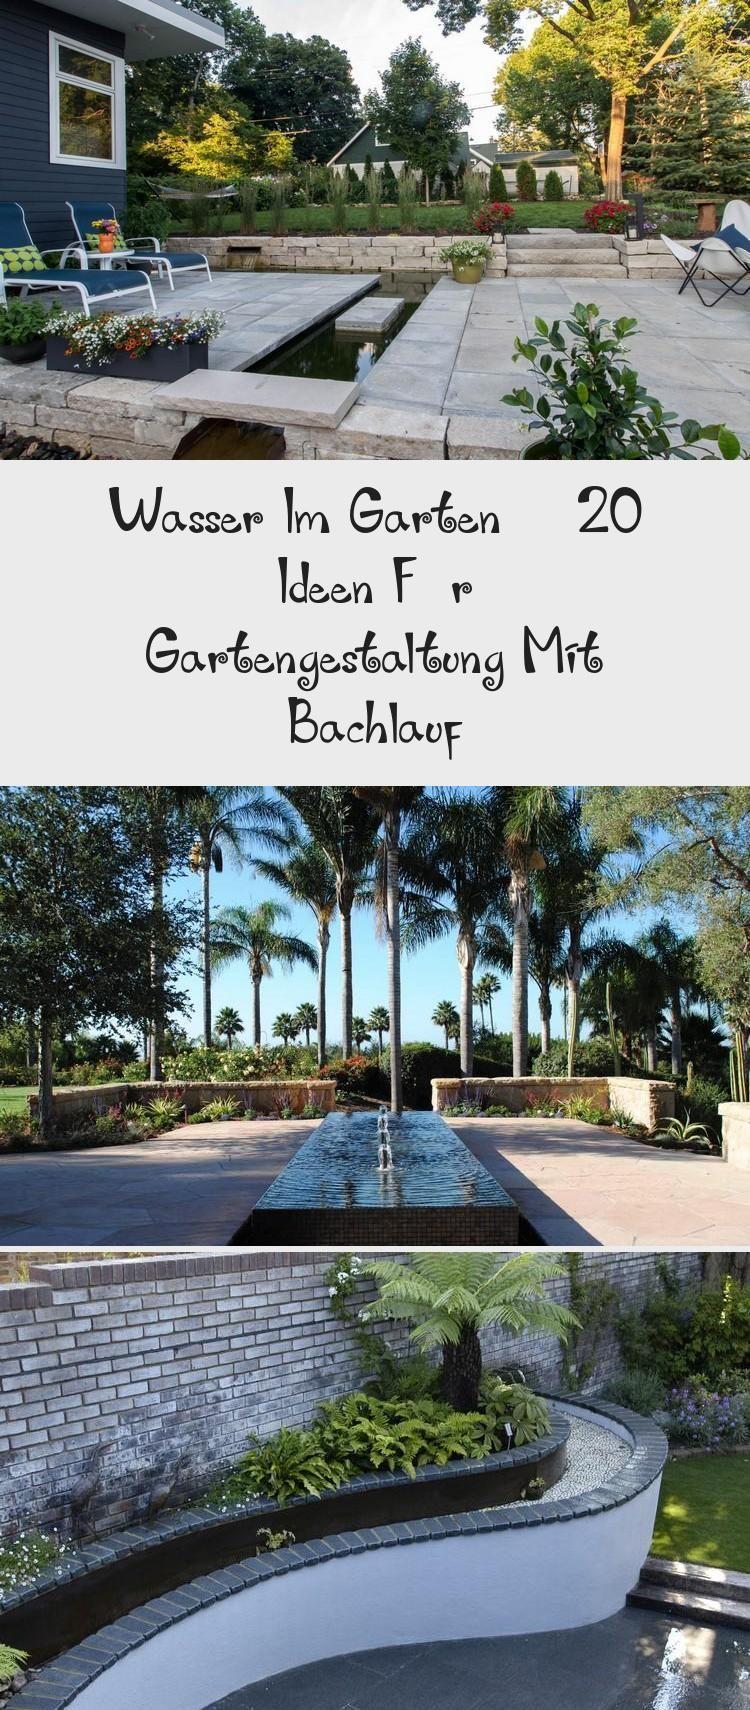 Wasser Im Garten 20 Ideen Fur Gartengestaltung Mit Bachlauf Wasser Im Garten 20 Ideen Fur Gartengestaltung Mit Bachla In 2020 Outdoor Outdoor Decor Decor